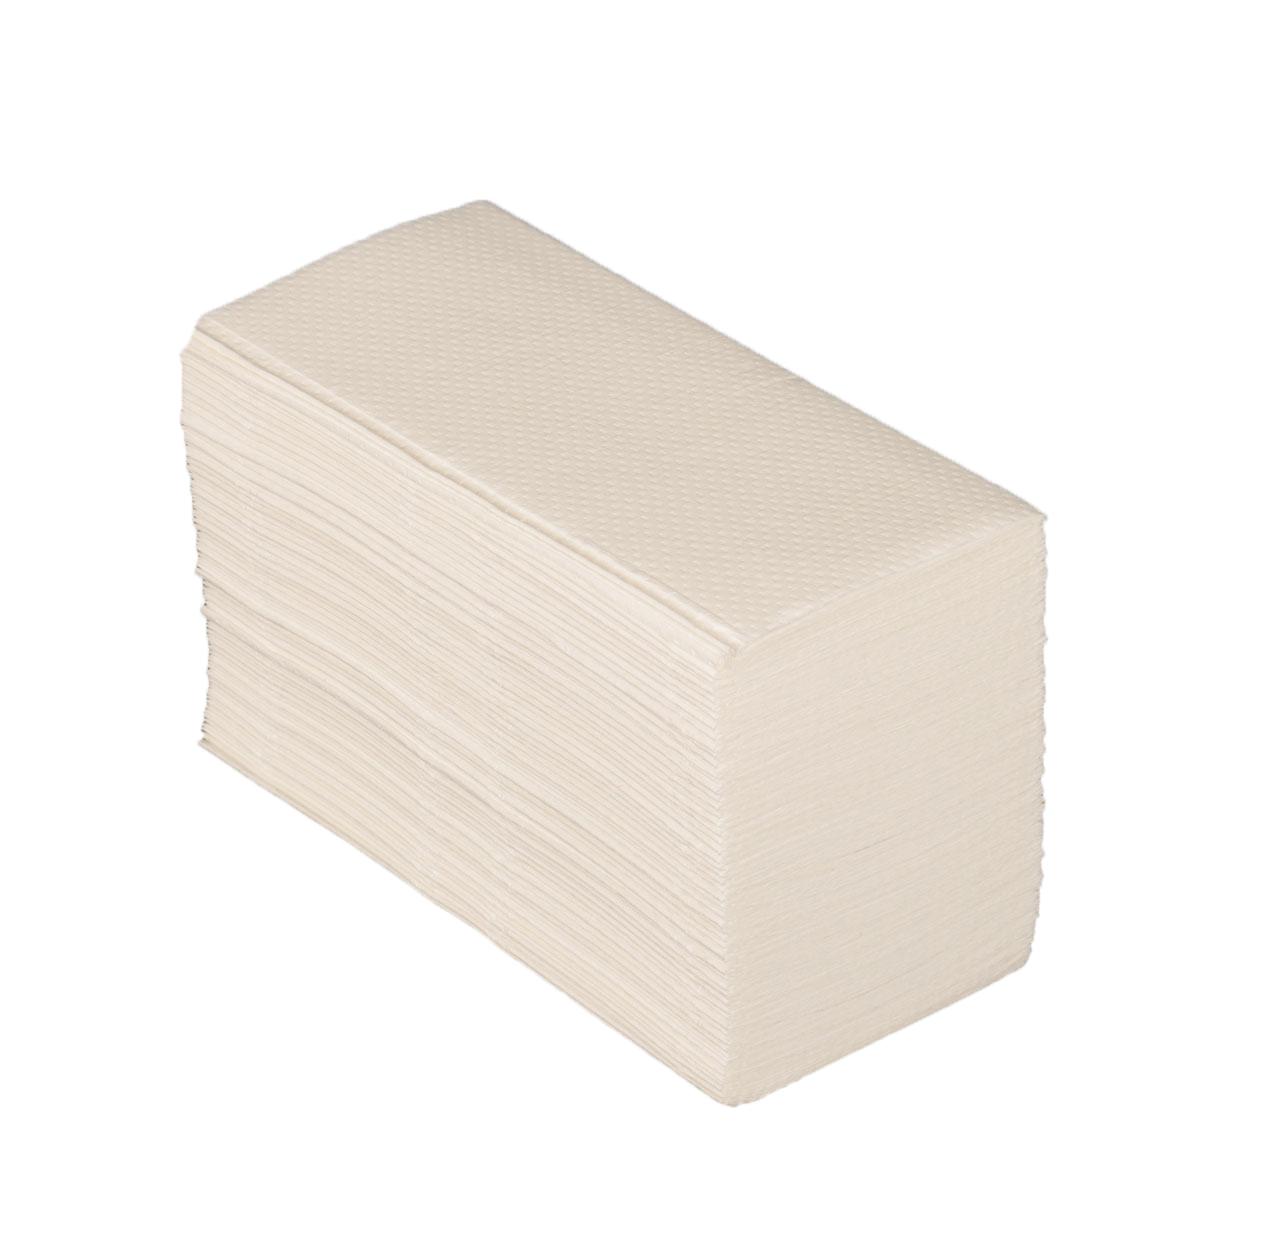 HANDTOWEL - White Vfold 23x25cm (rec.1p)